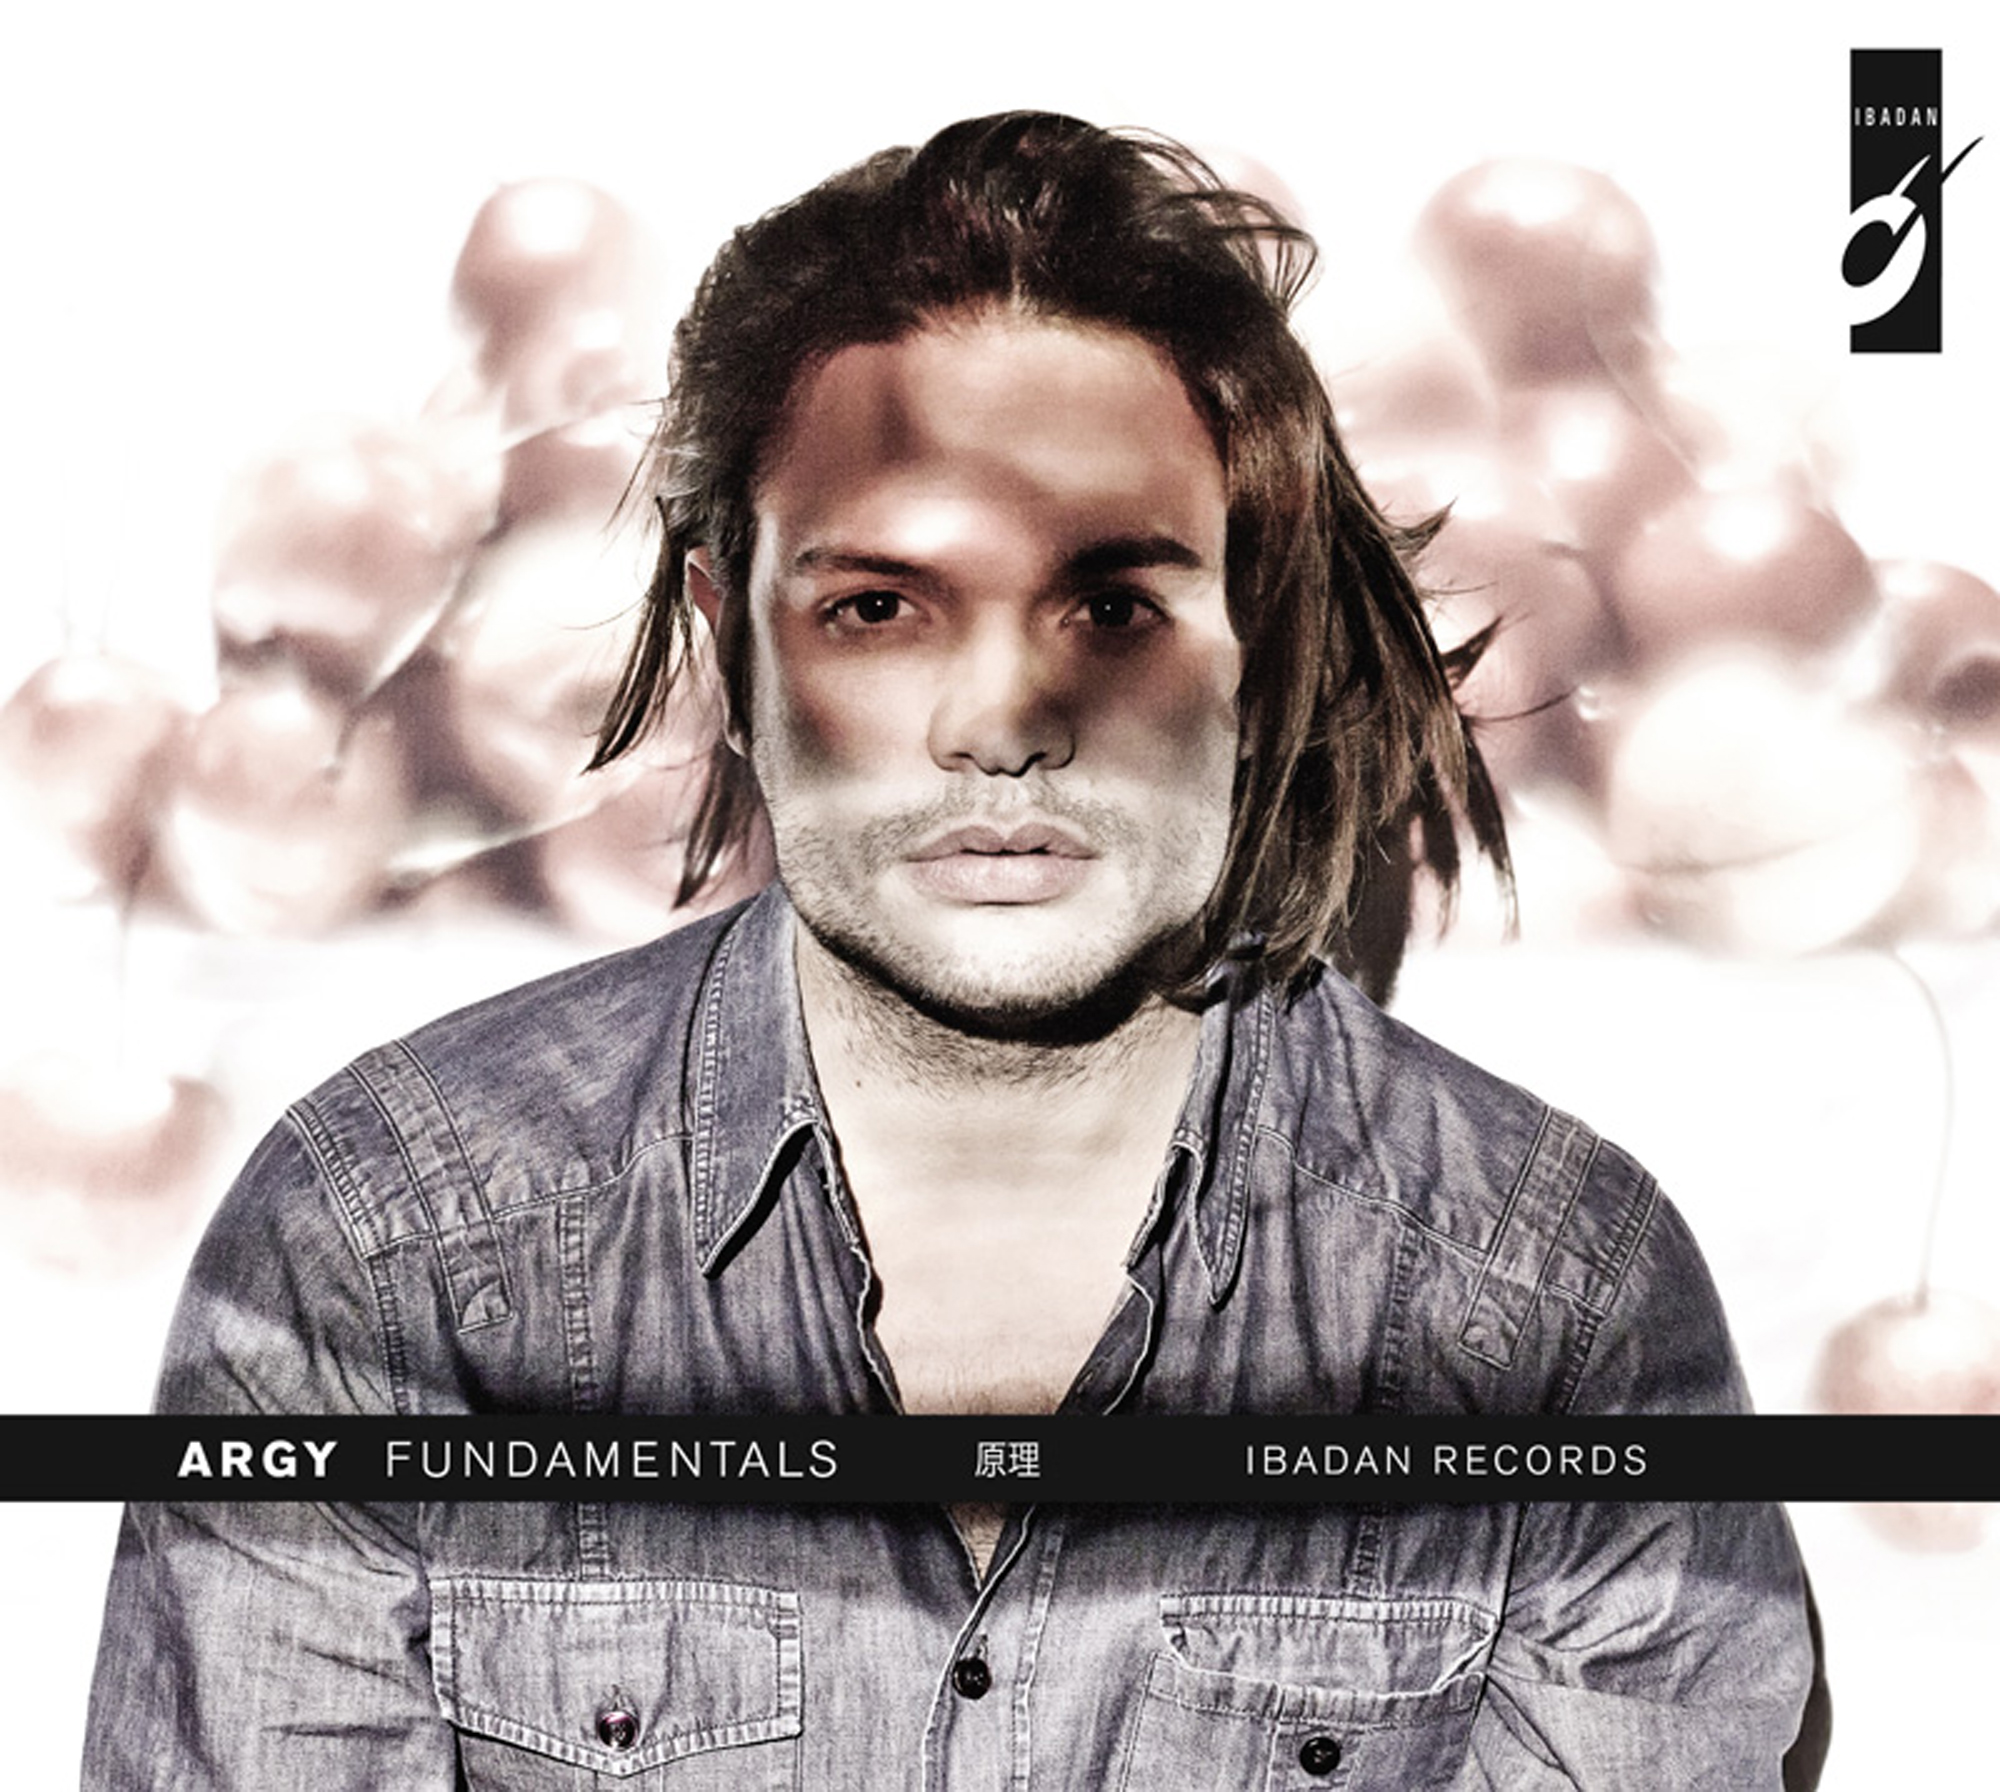 Argy - Fundamentals